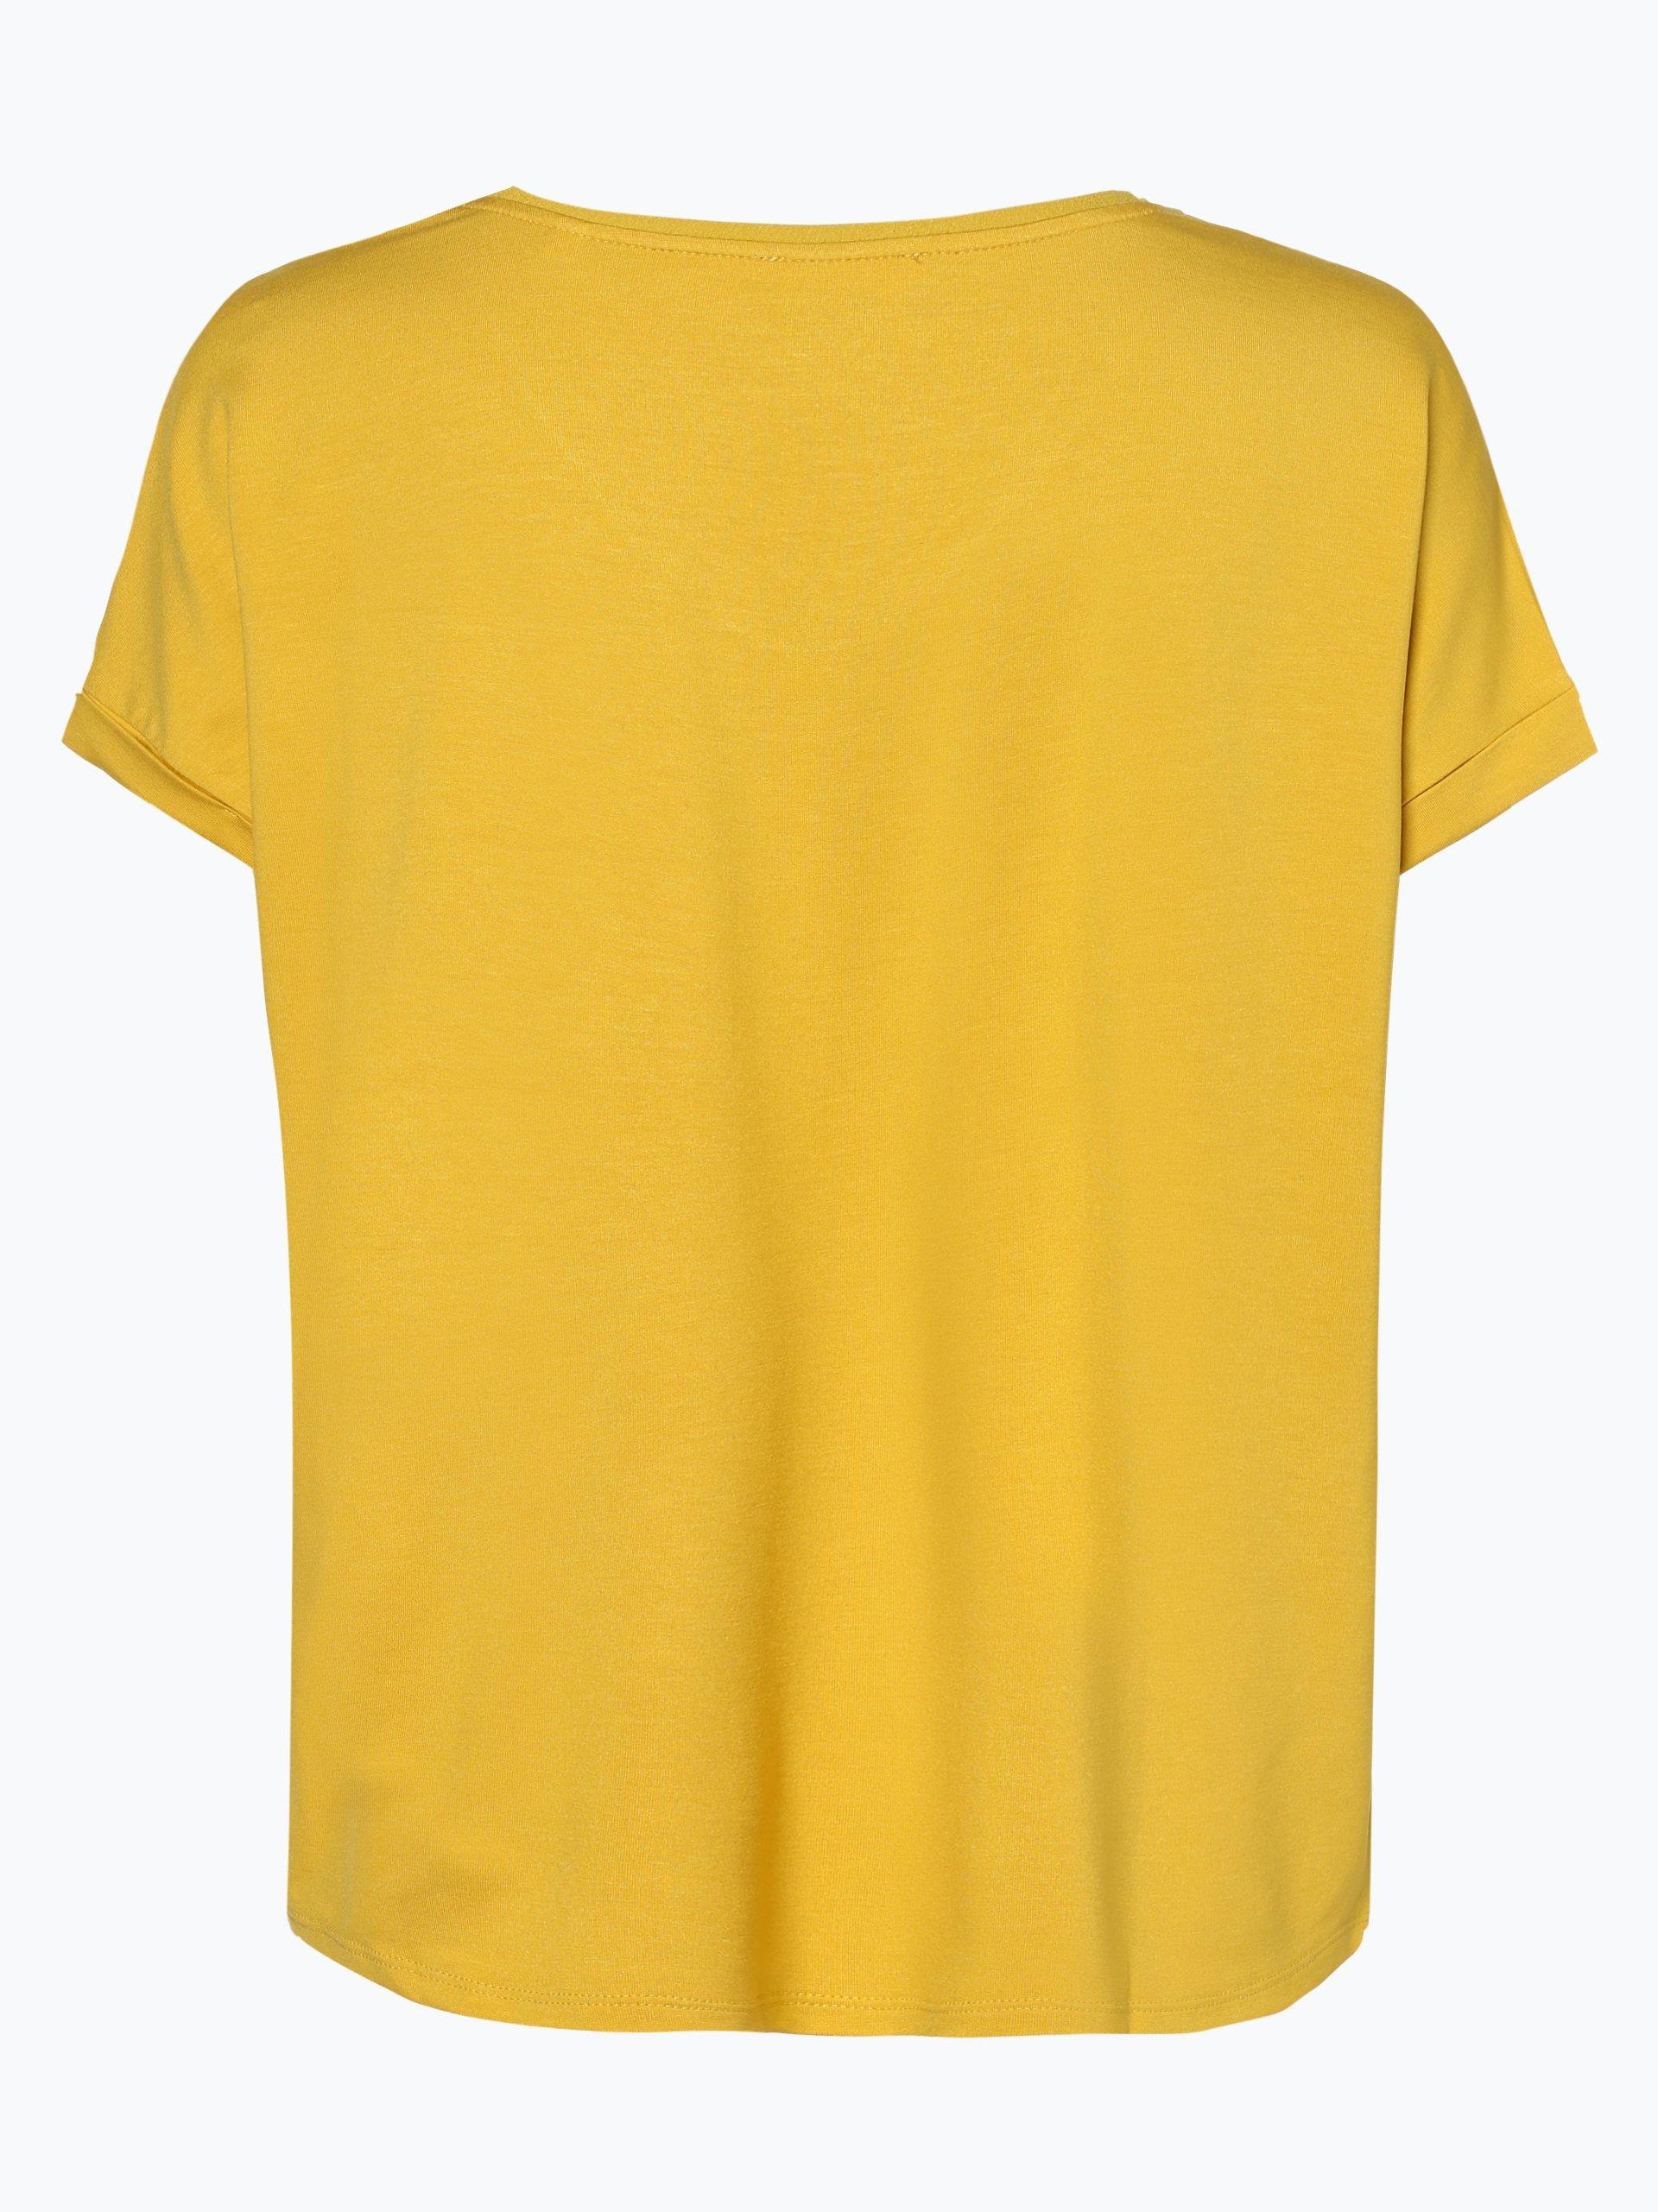 Opus Damen T-Shirt - Suminchen